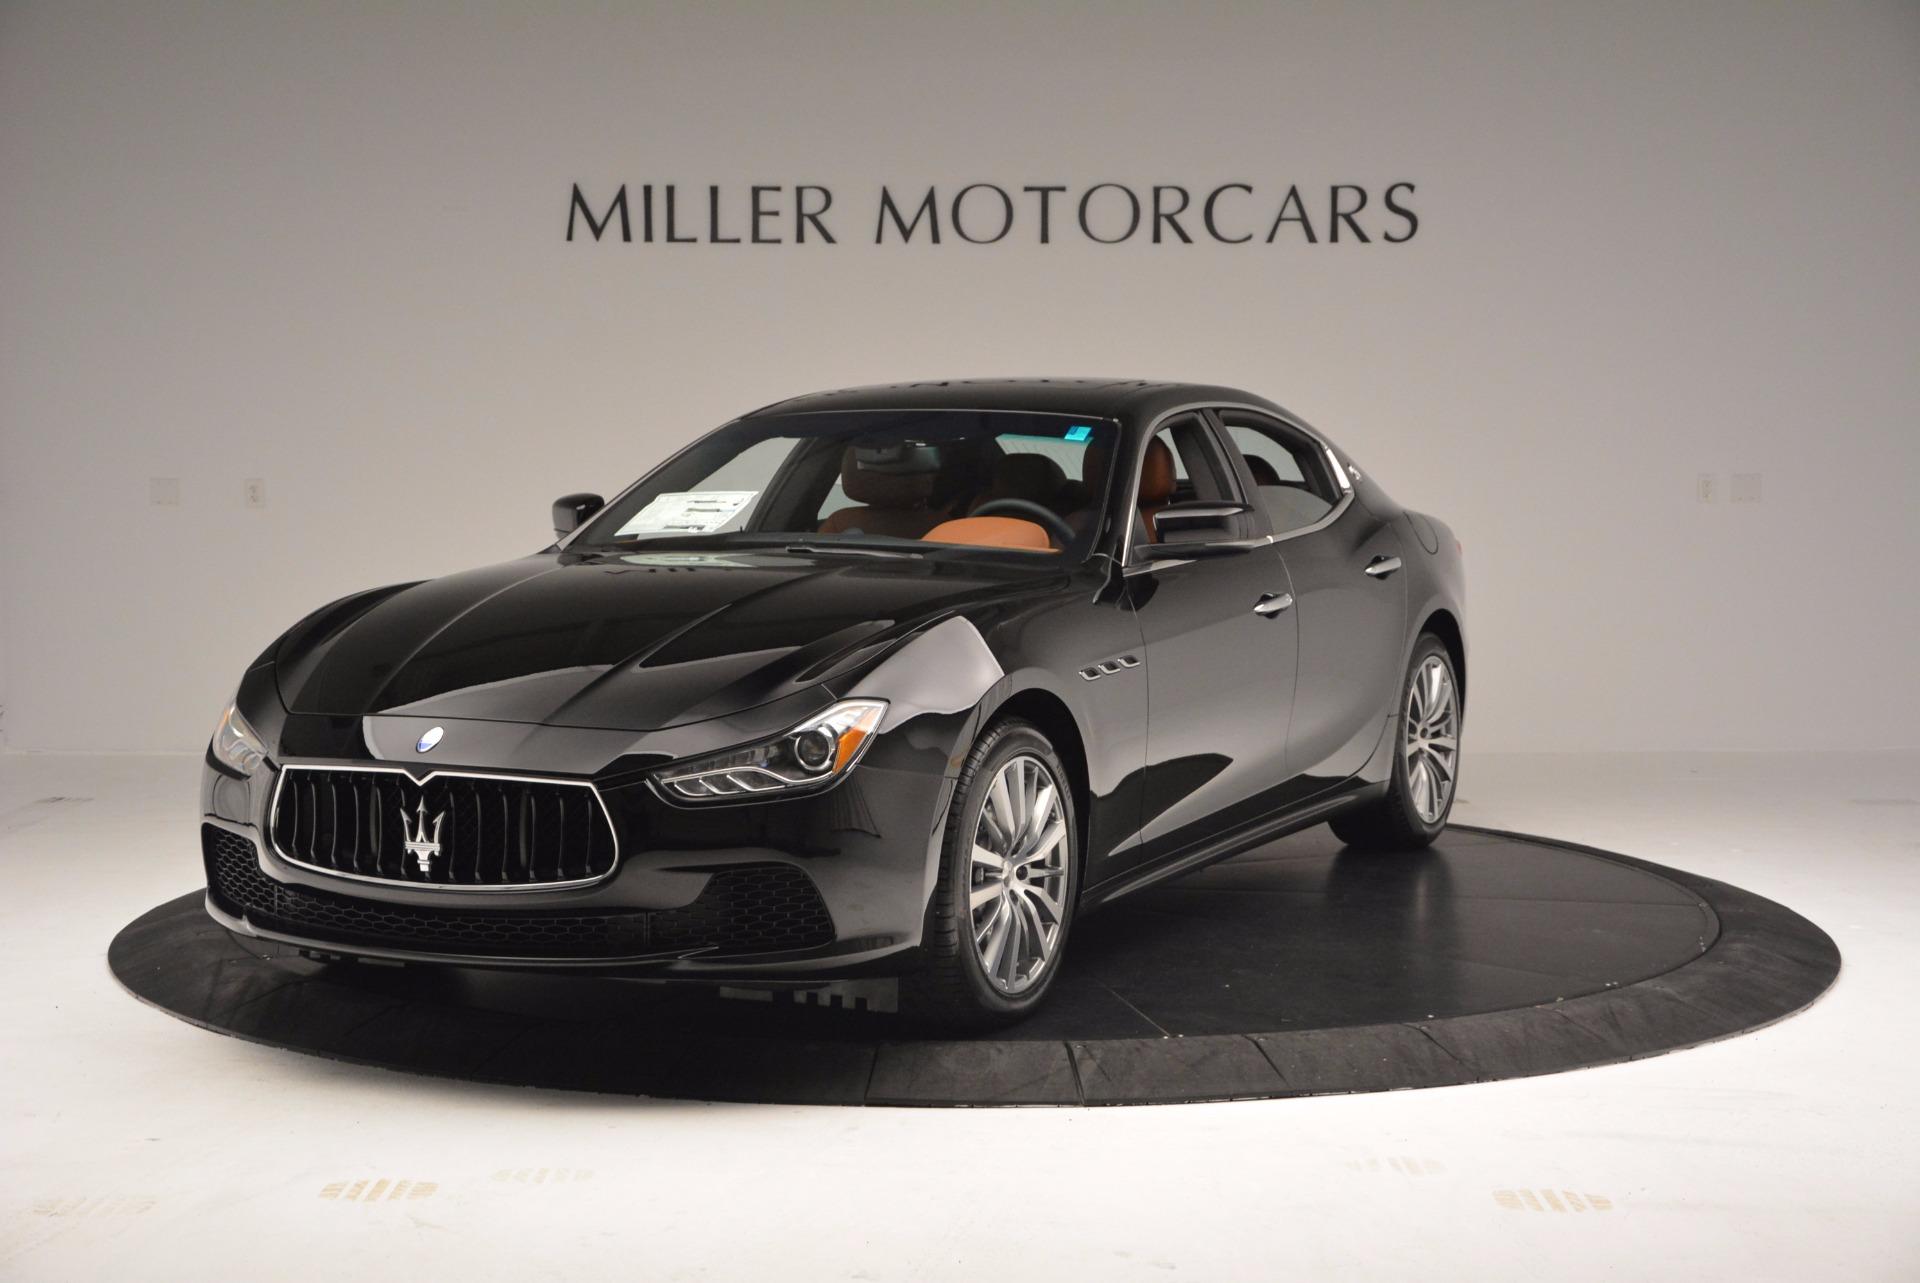 Used 2017 Maserati Ghibli SQ4 S Q4 Ex-Loaner for sale Sold at Bugatti of Greenwich in Greenwich CT 06830 1